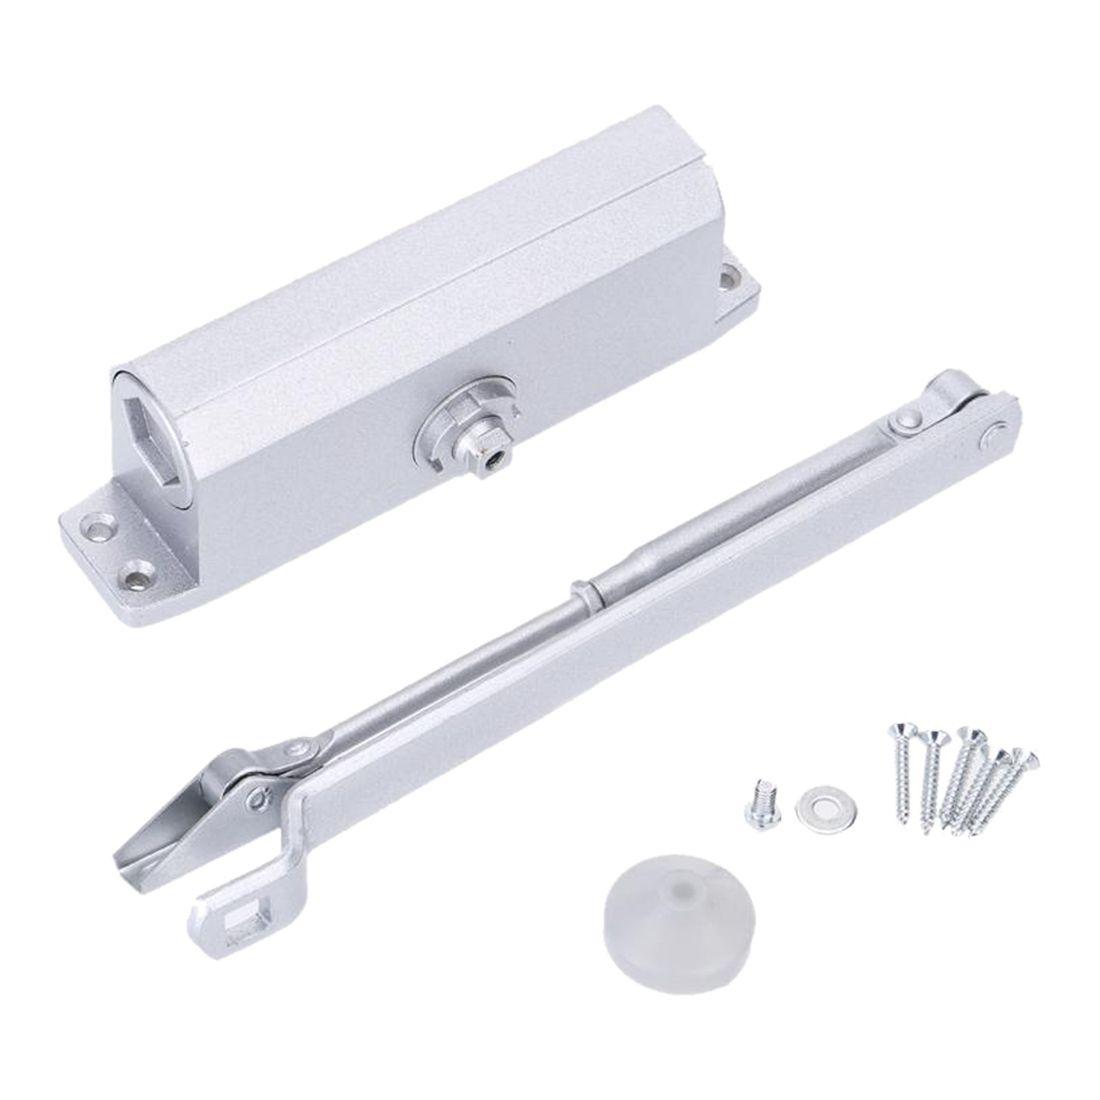 Aluminum Alloy 35kg Automatic Hydraulic Door Closer With Parallel Bracket E4i2 Automatic Door Opener Aluminium Alloy Automatic Door